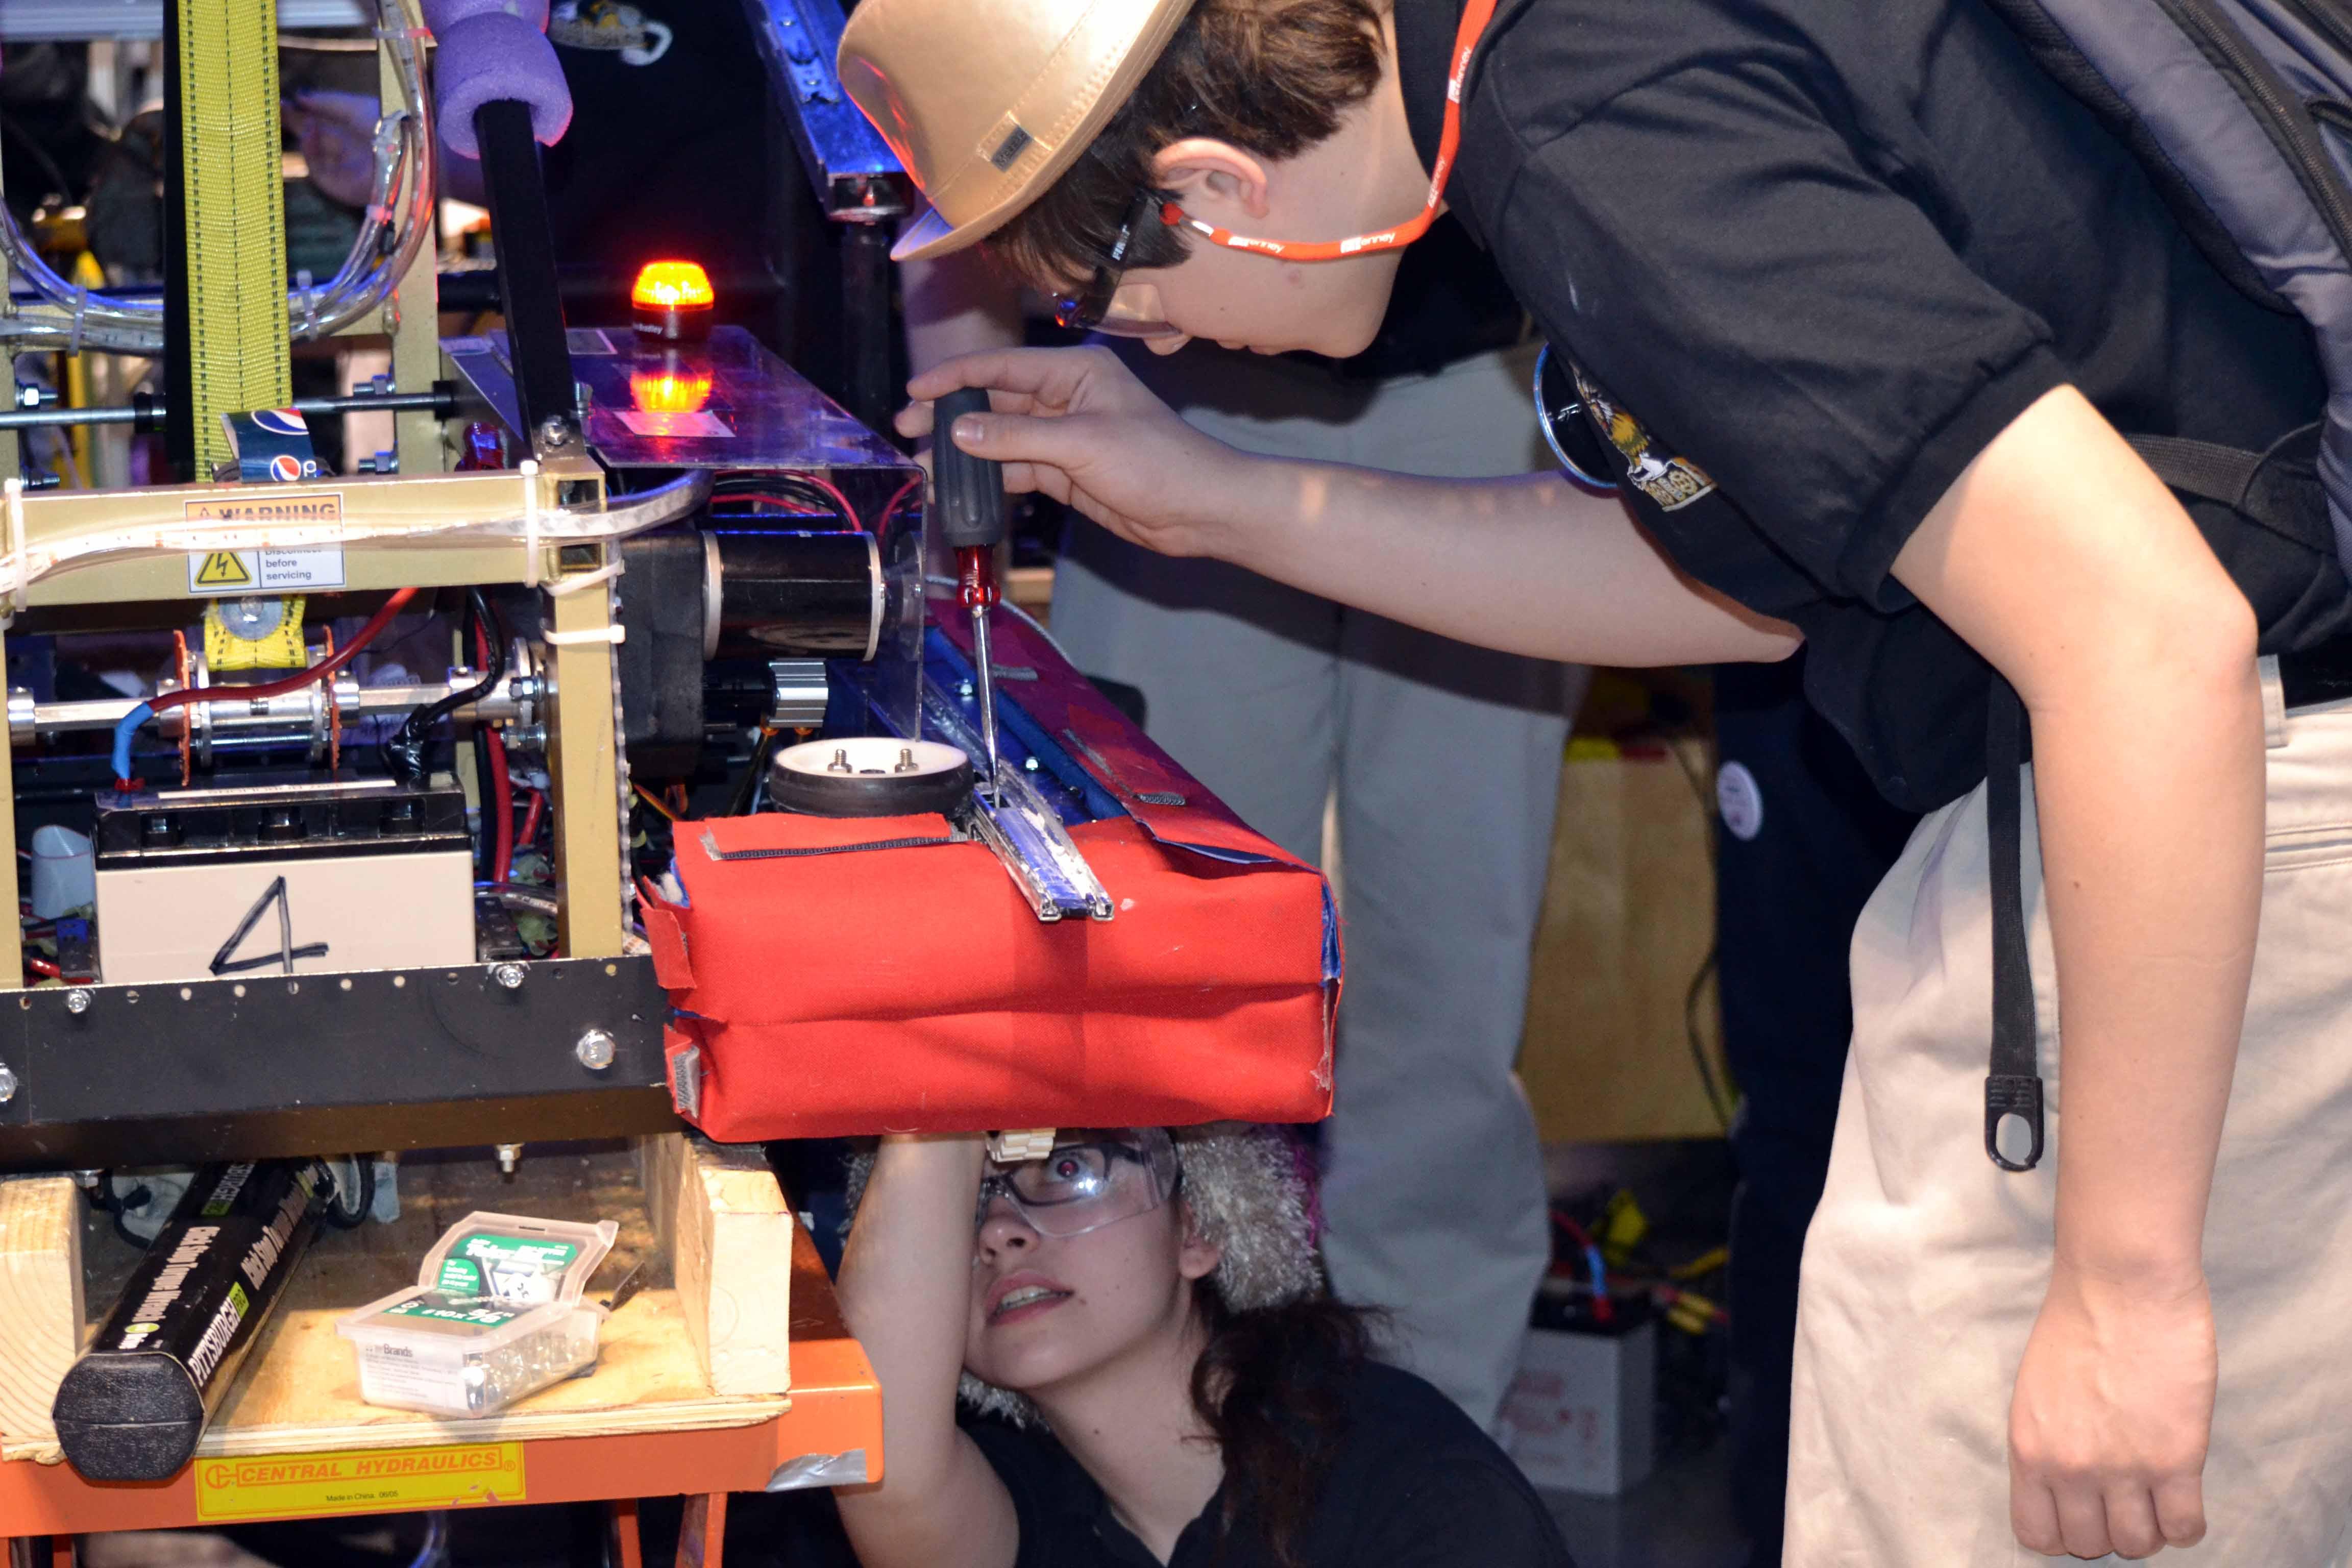 Walter Deitzler, team captain, and Christine Politte, head electrician, work on the robot.